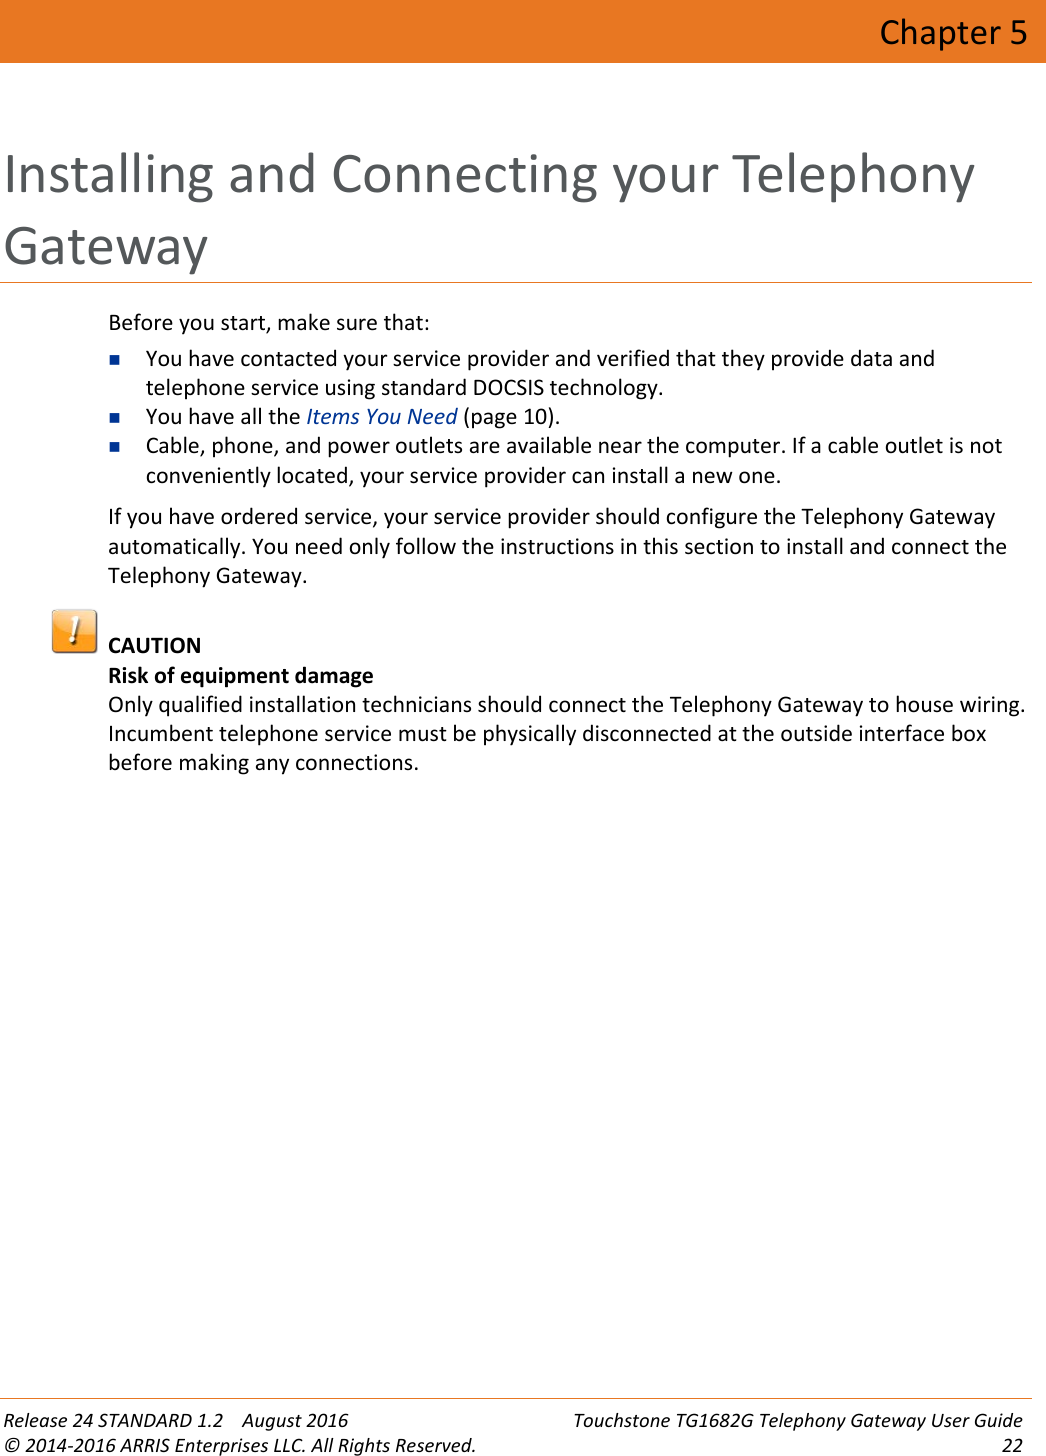 Arris TG1682G User Manual TG1682G: Guide Guide unlocked